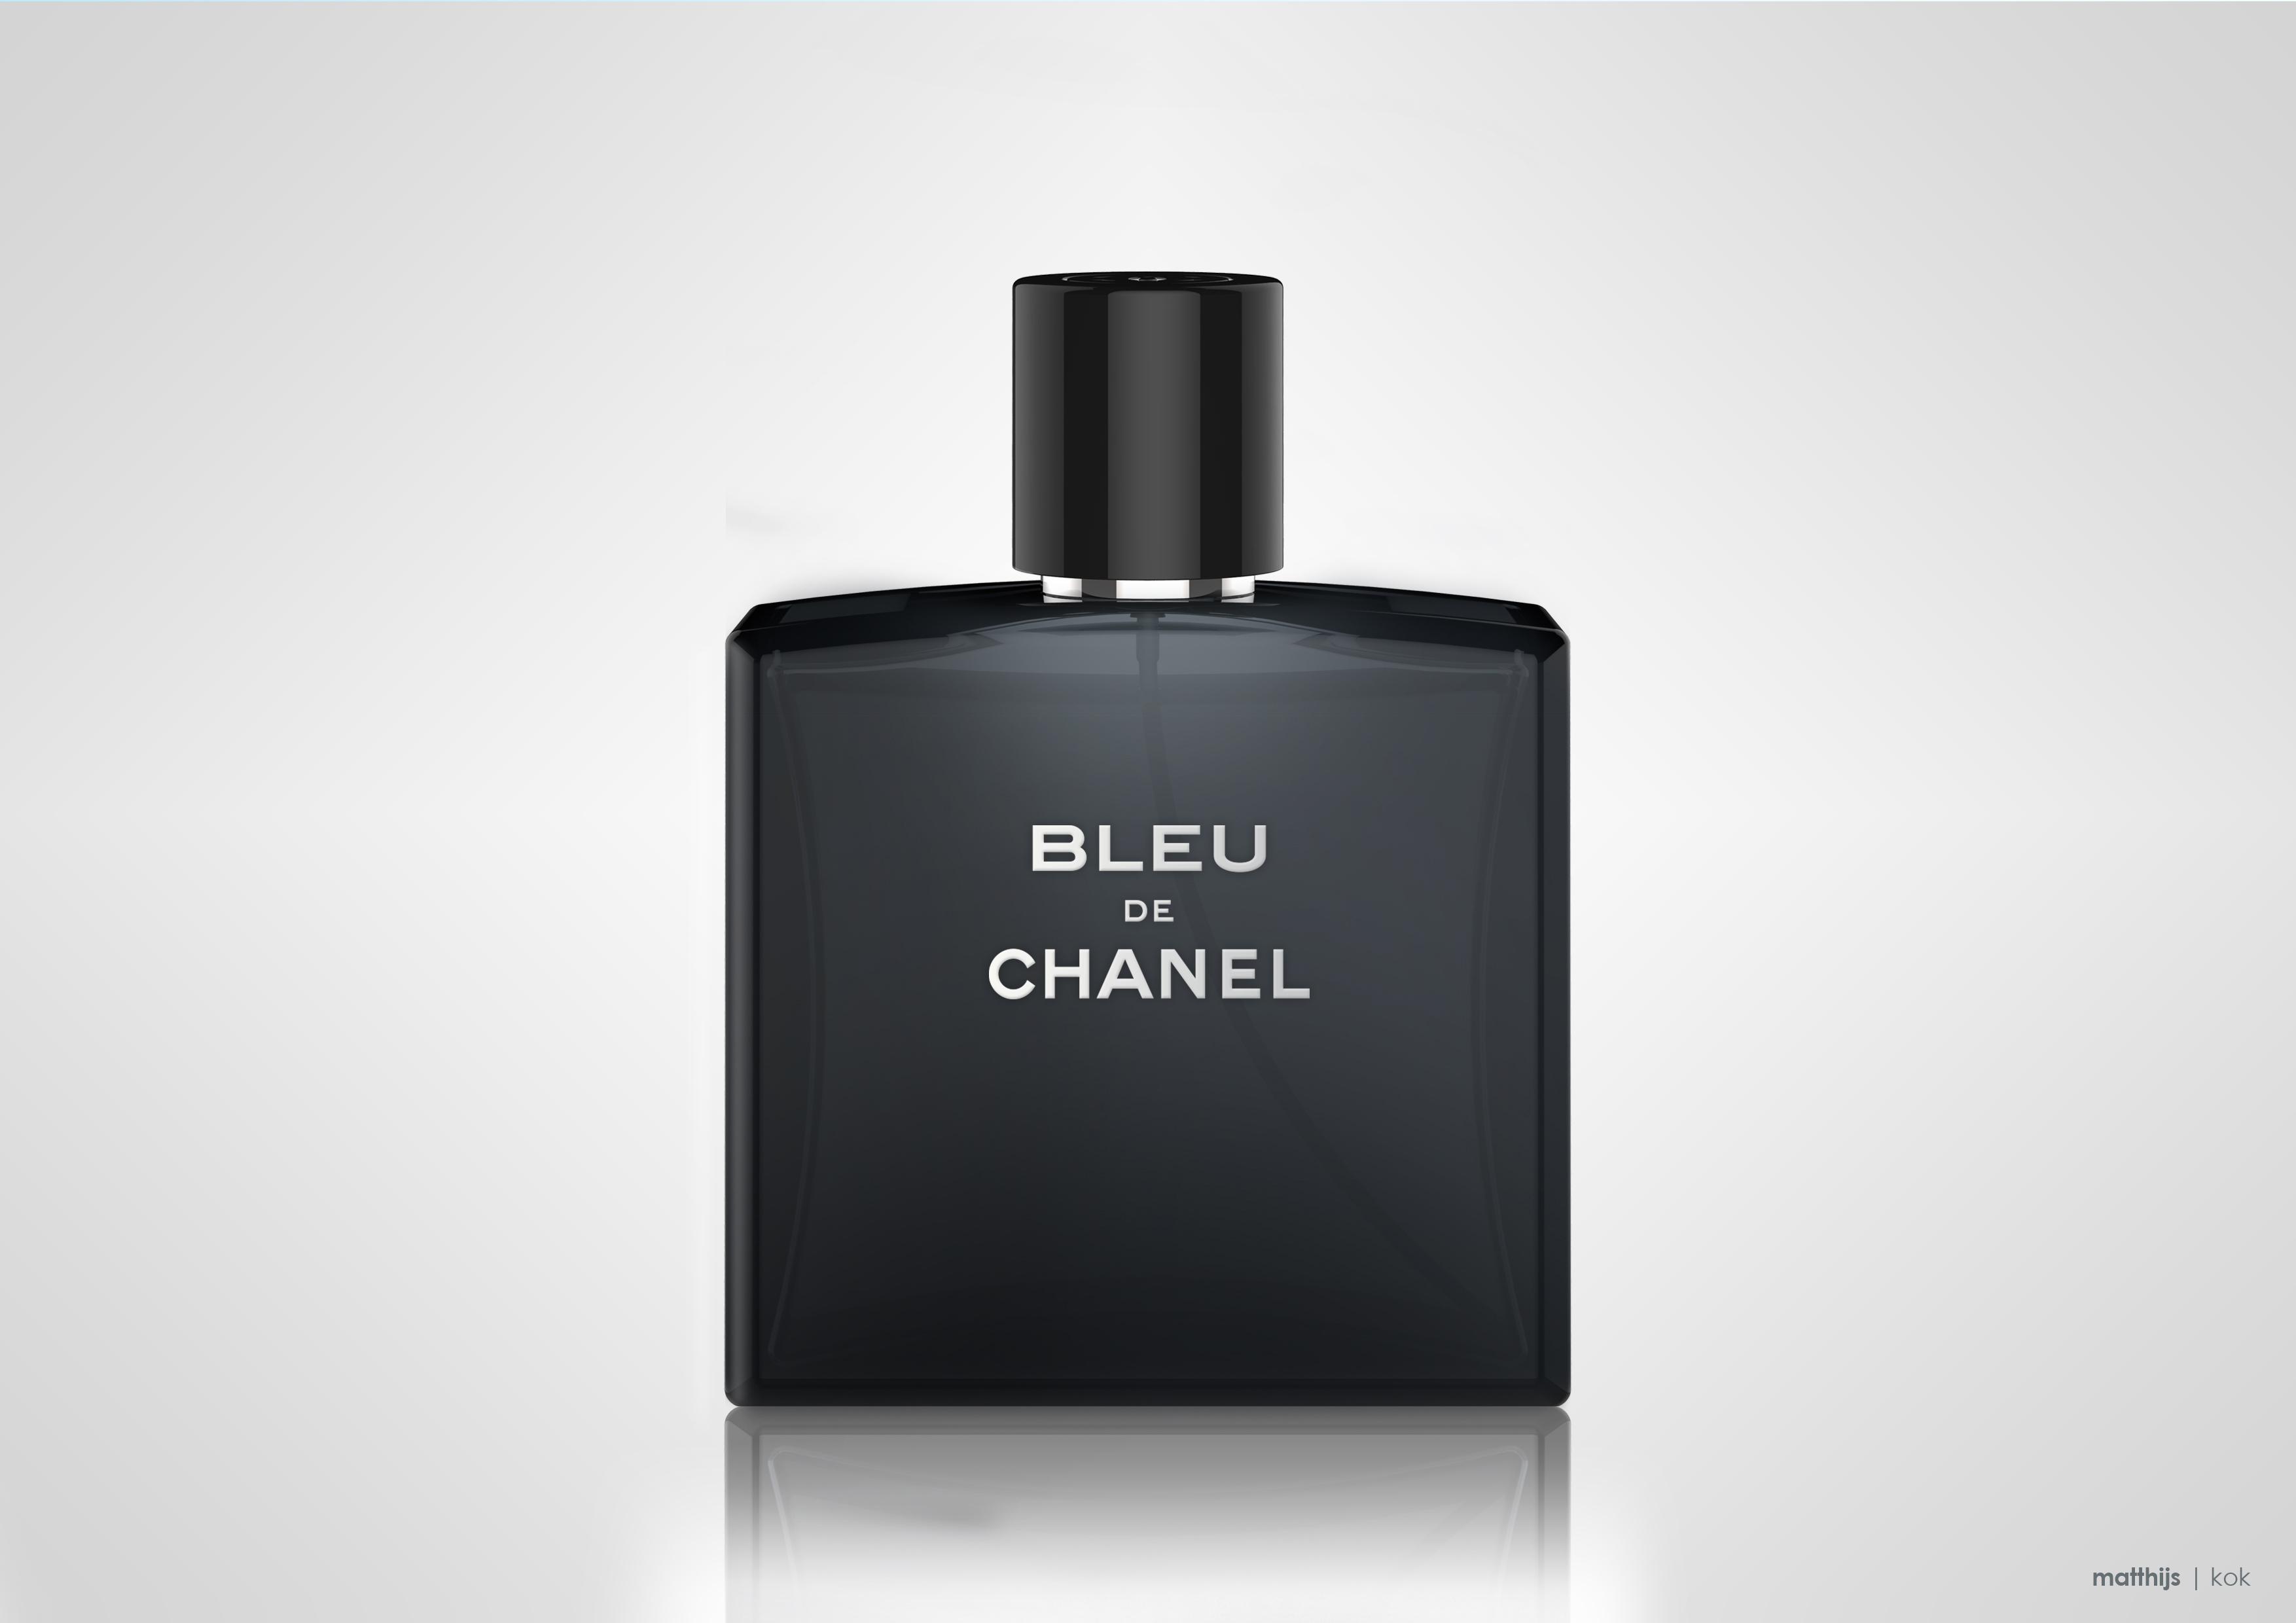 Bleu de Chanel | Rendering by Matthijs Kok